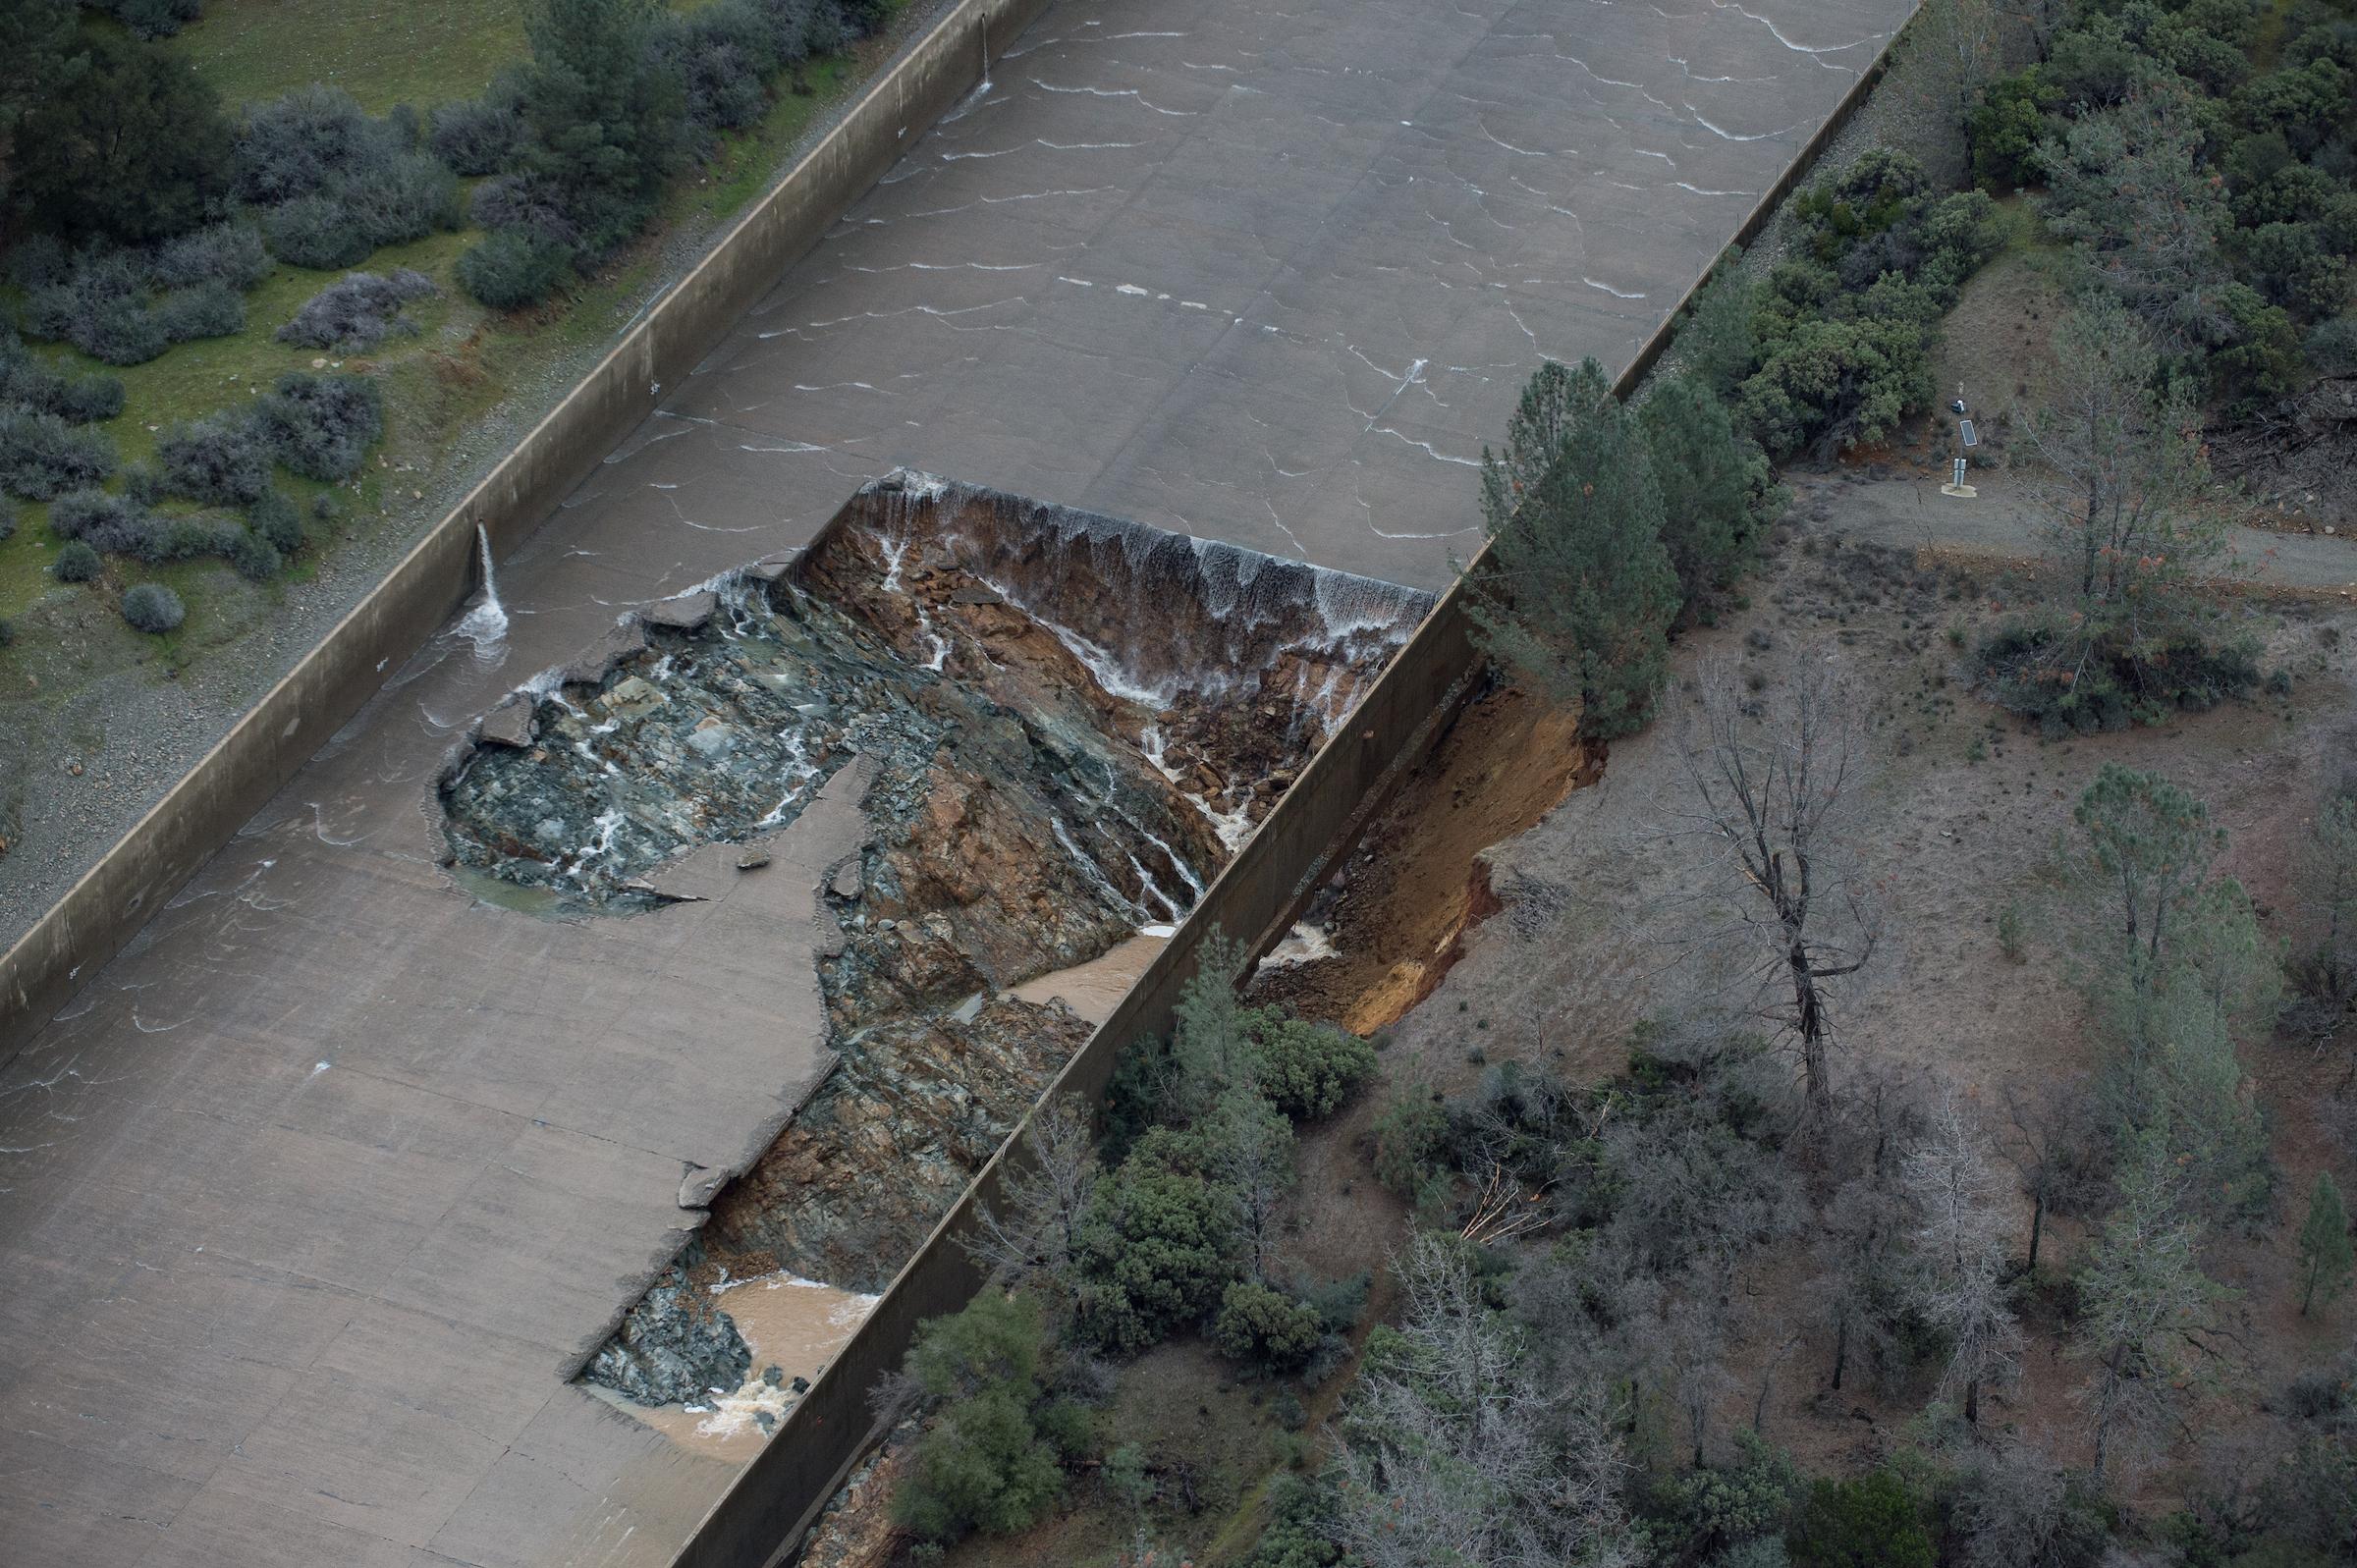 Oroville Update: Evacuation Advisory Finally Lifted | The California